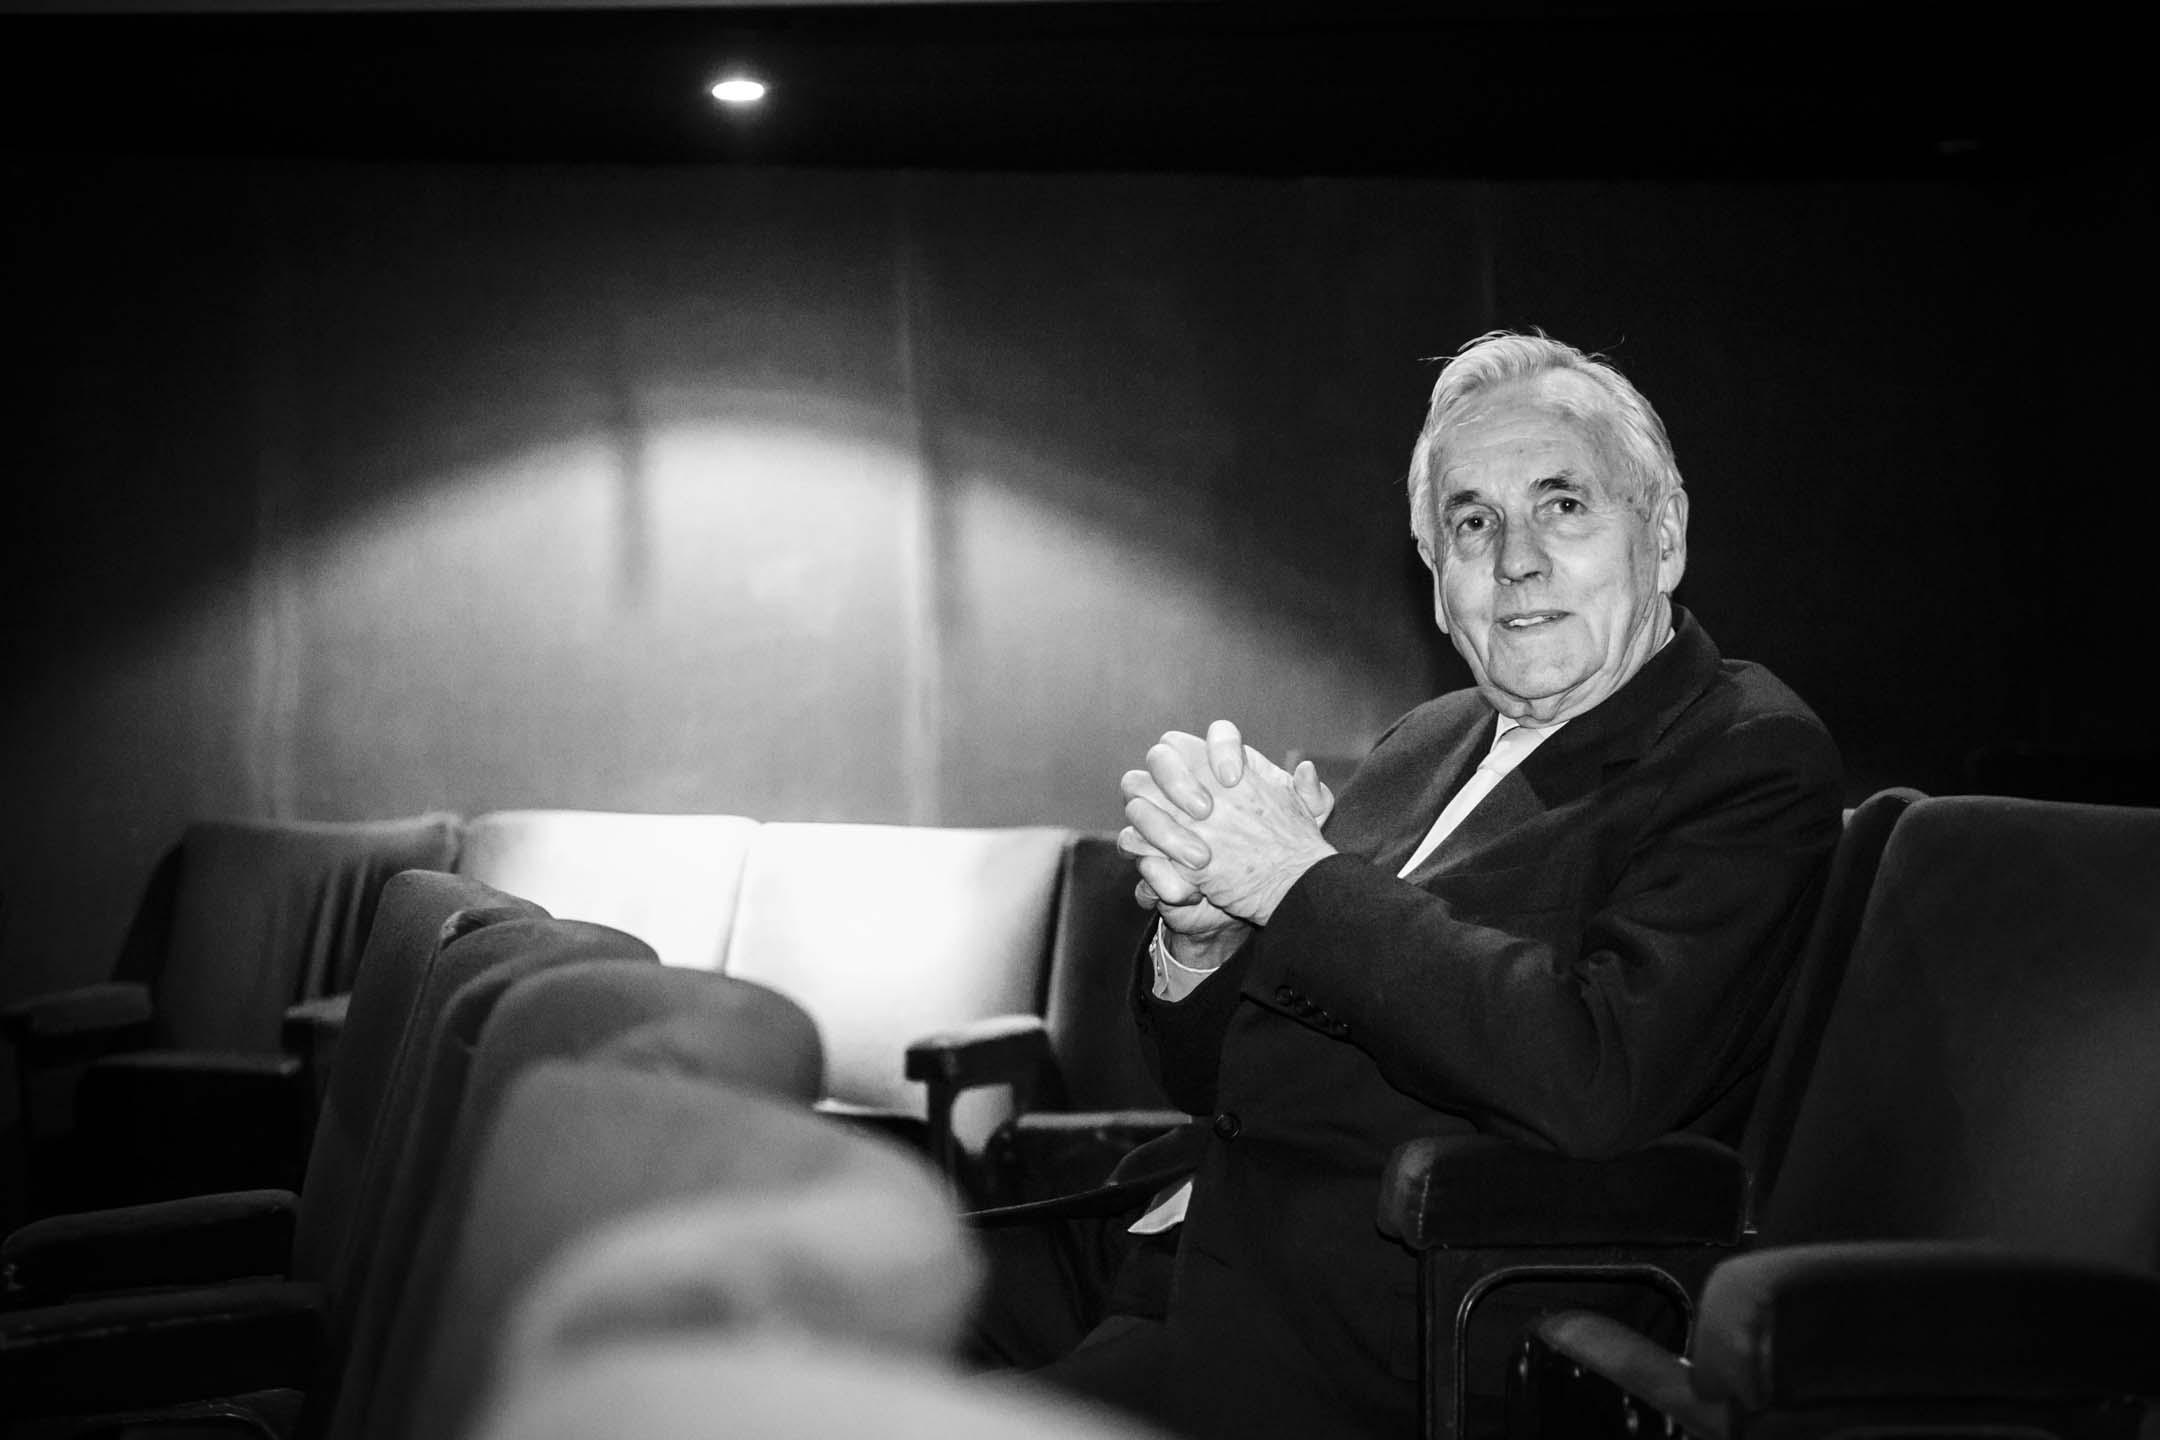 gloucestershire corporate photographer business owner headshot portraits martin graham longborough festival opera